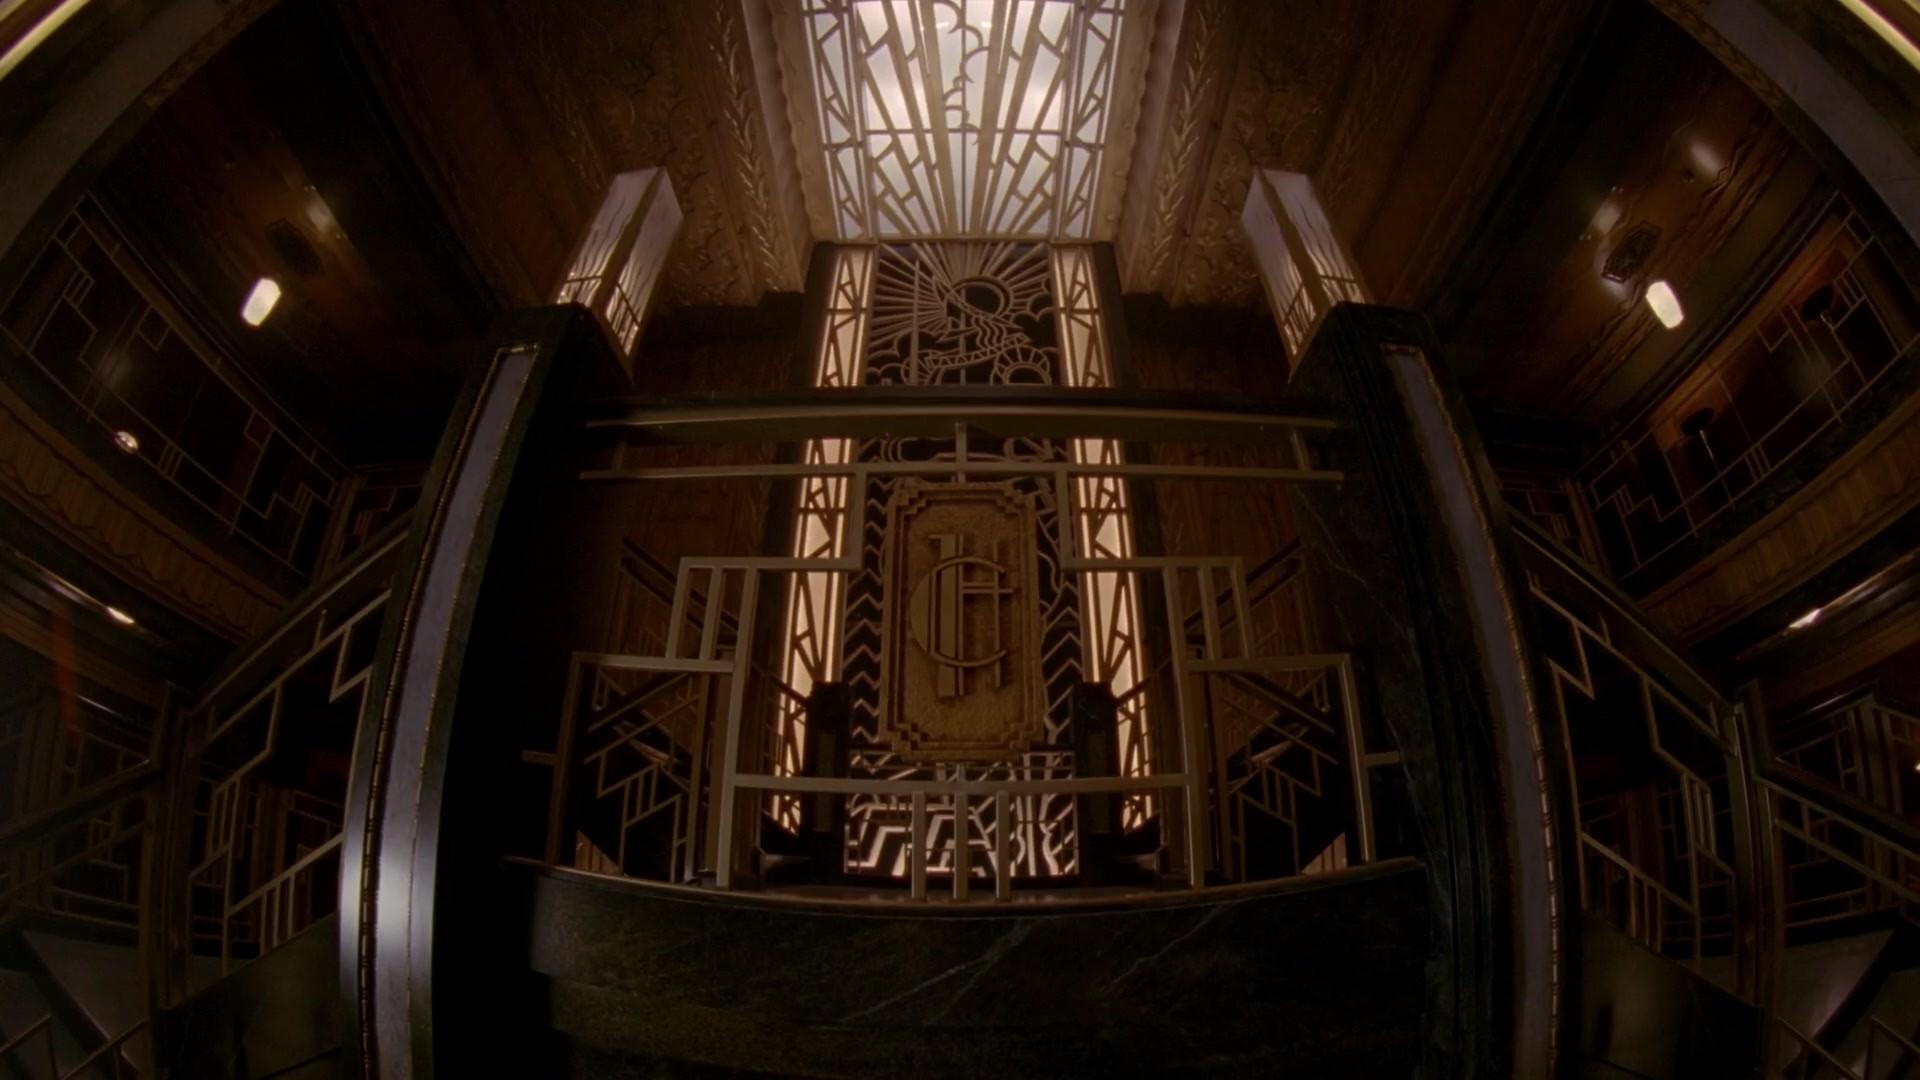 Image – Hotel Cortez Lobby 003.jpeg   American Horror Story Wiki   FANDOM  powered by Wikia